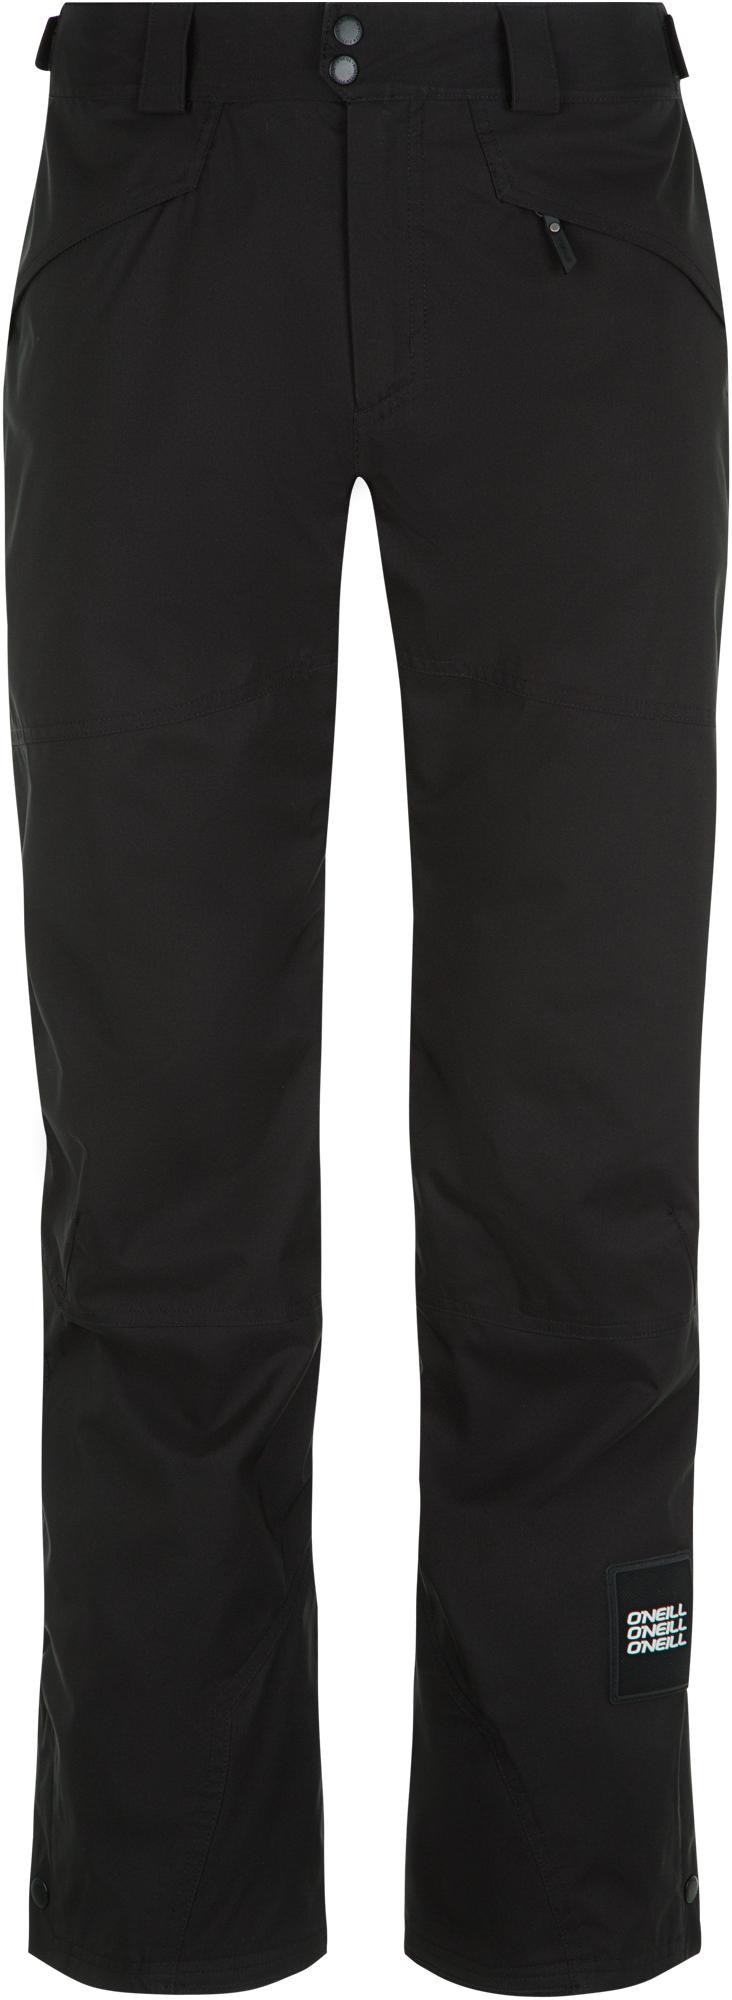 O'Neill Брюки мужские O'Neill Pm Hammer Slim, размер 46-48 цена и фото